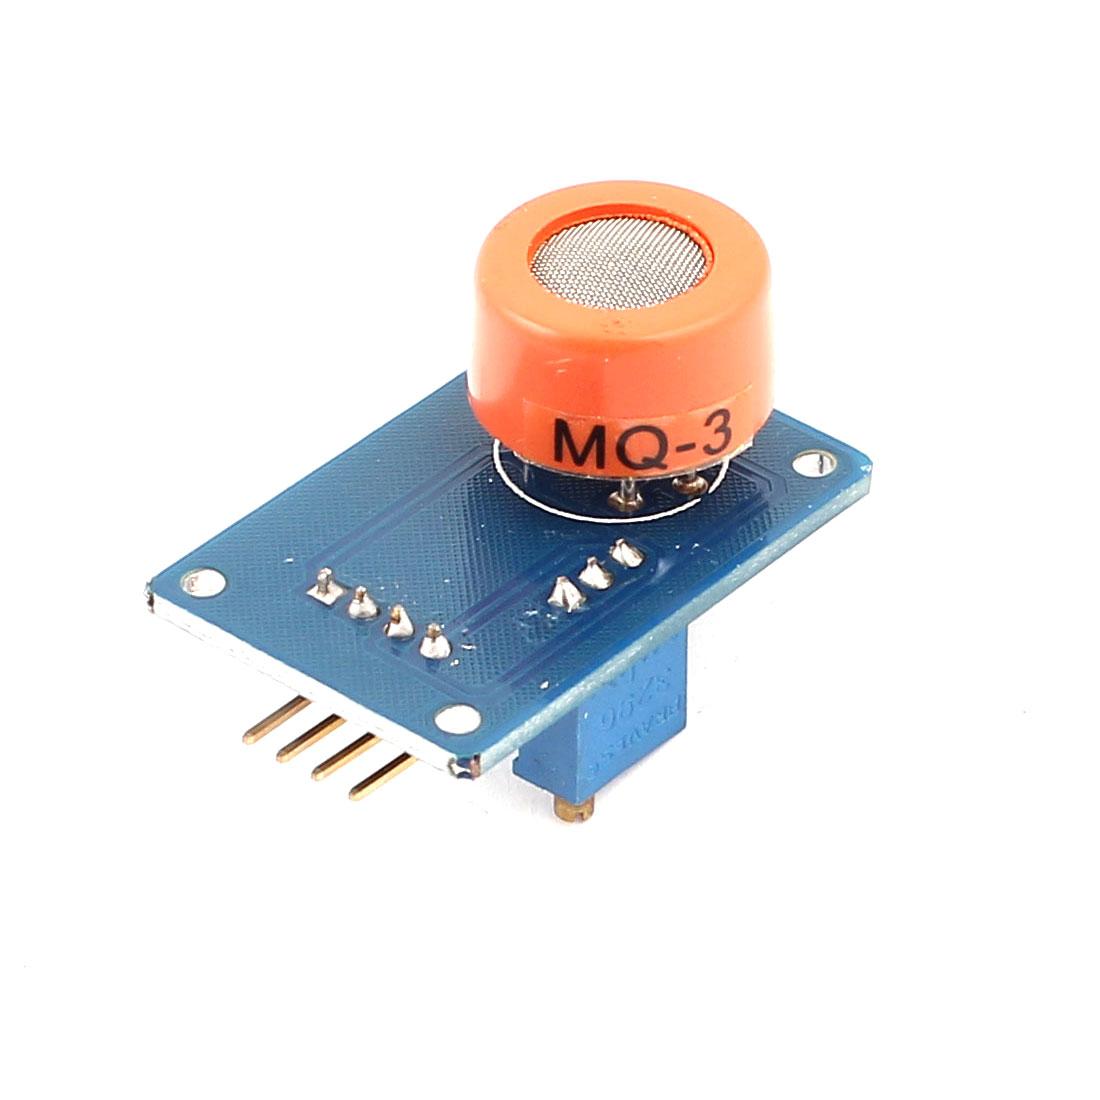 DIY Alcohol Ethanol Gas Detection Sensor Alarming Module MQ-3 for MCU